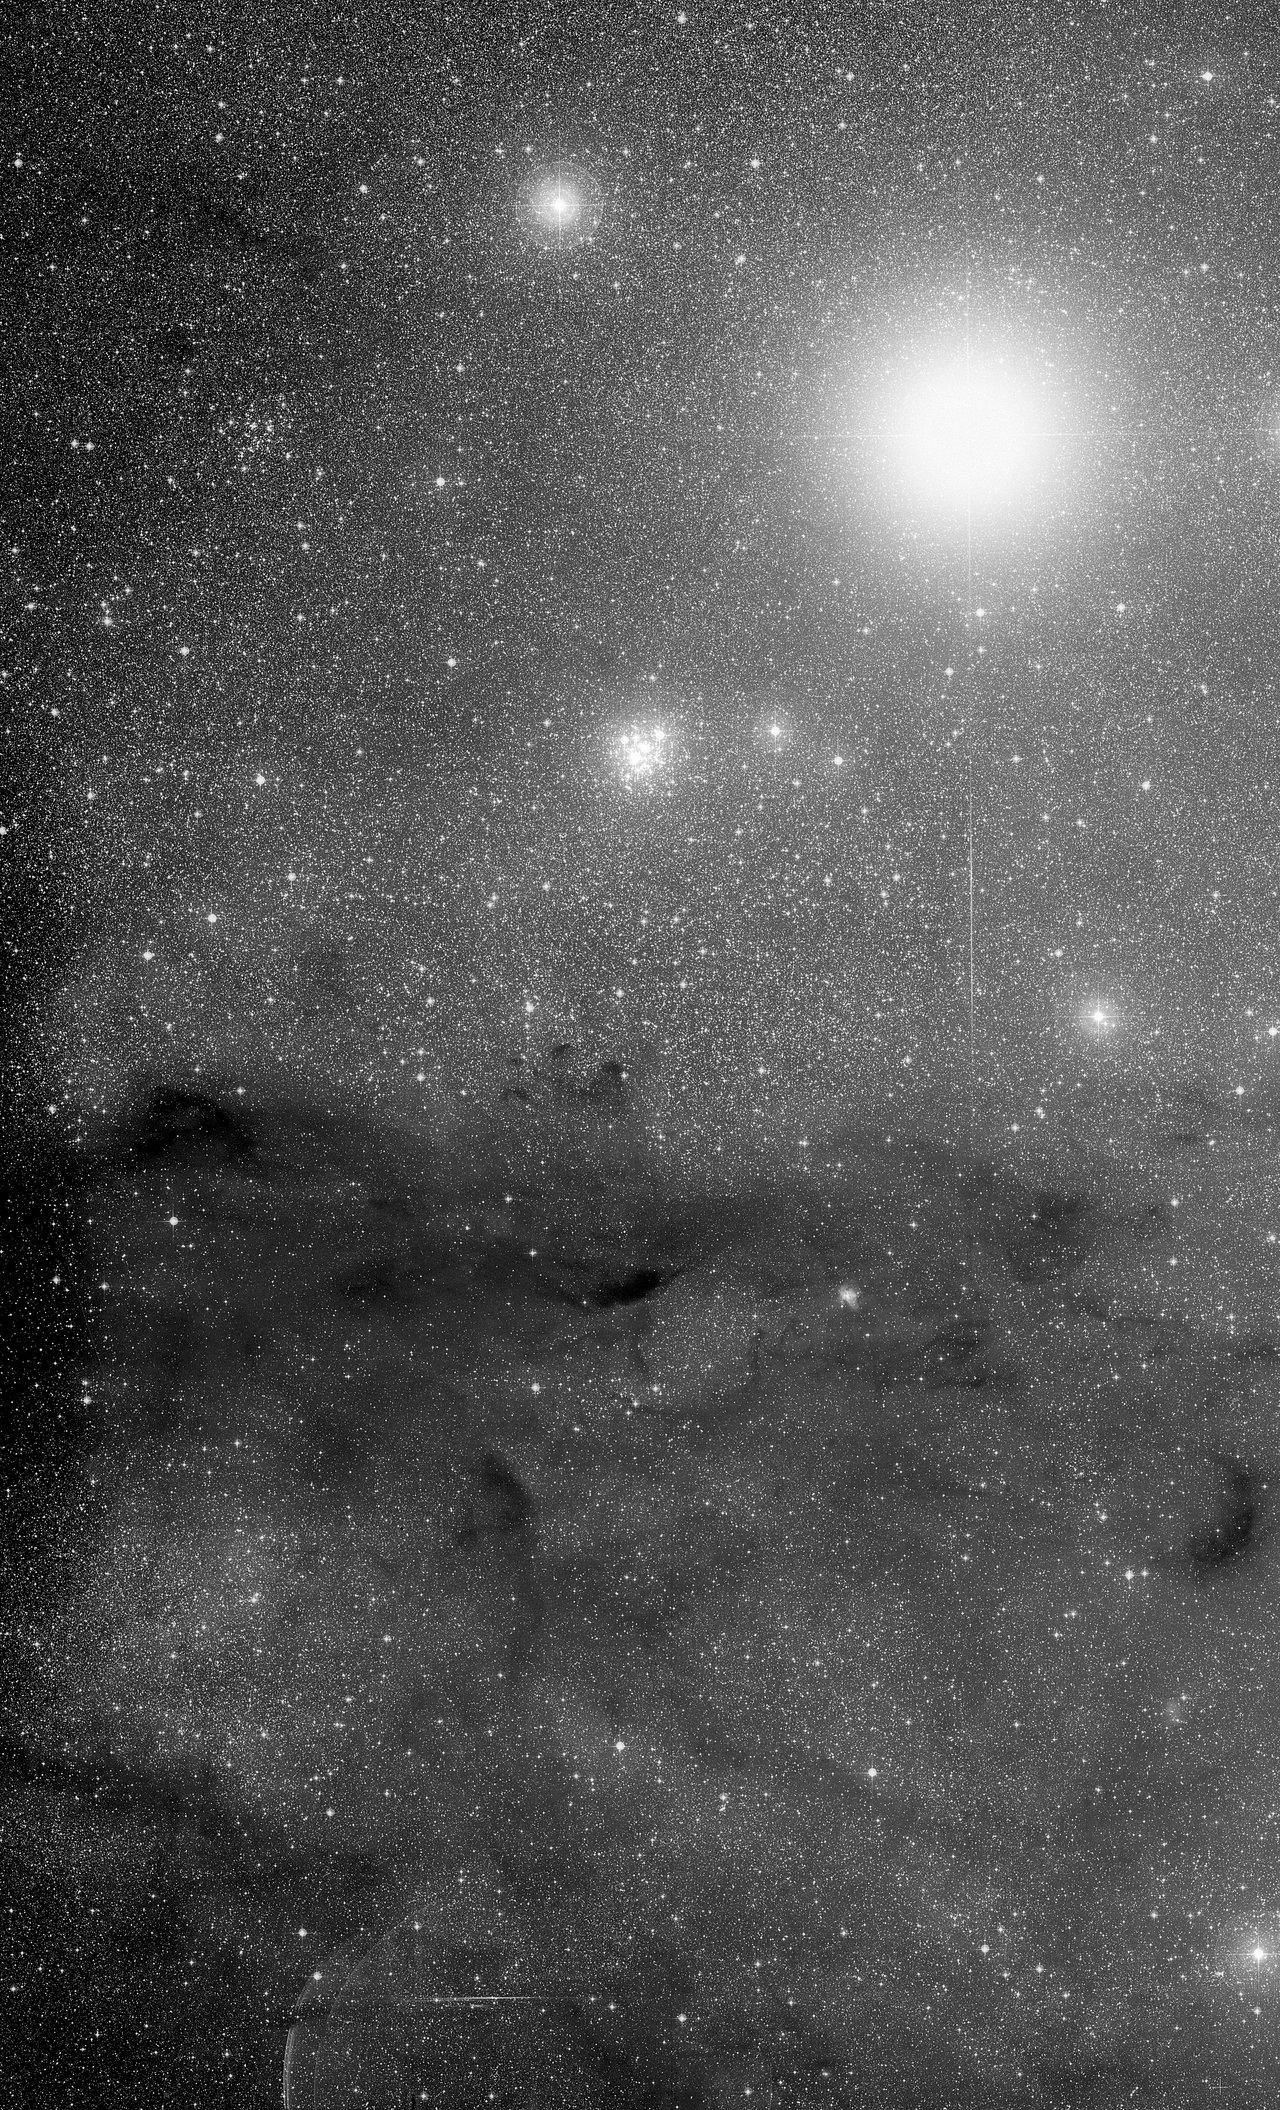 The Jewel Box cluster and the Coalsack Nebula